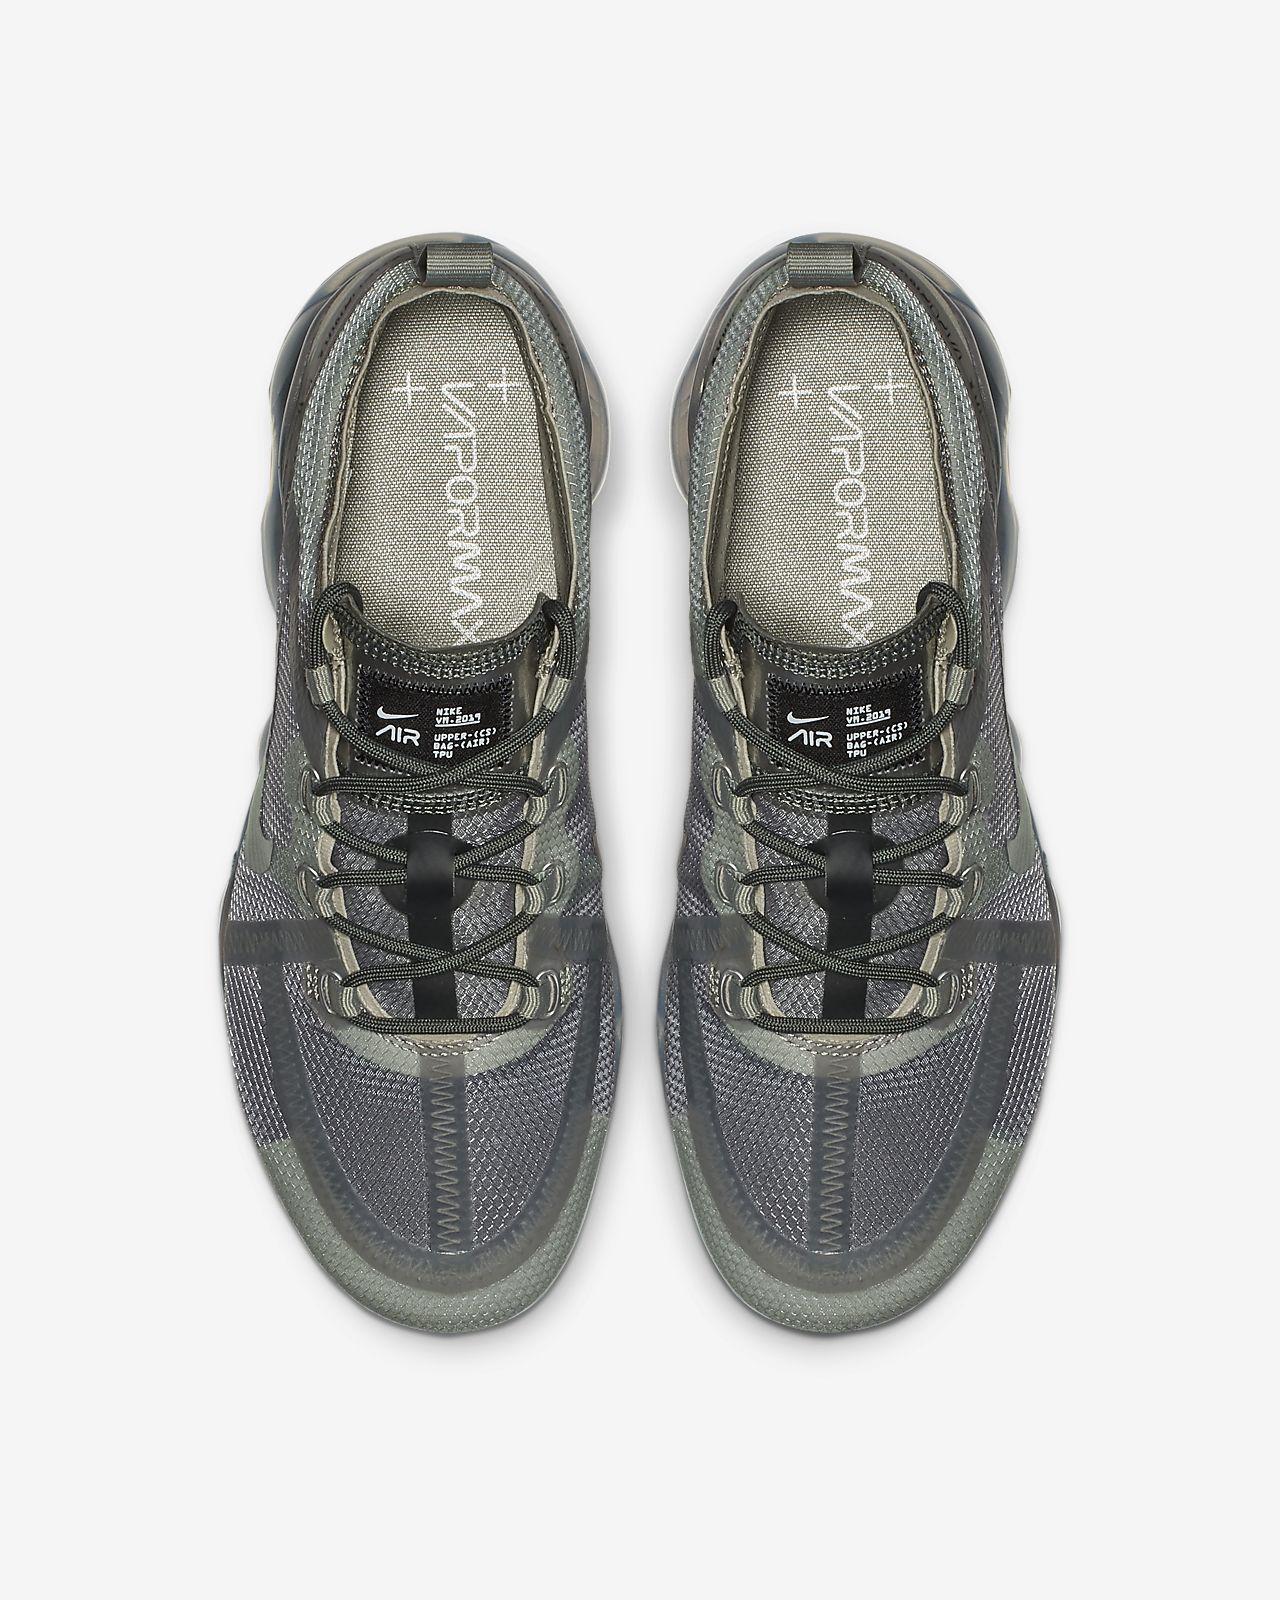 96b622390a0 Nike Air VaporMax 2019 Premium Women s Shoe. Nike.com VN